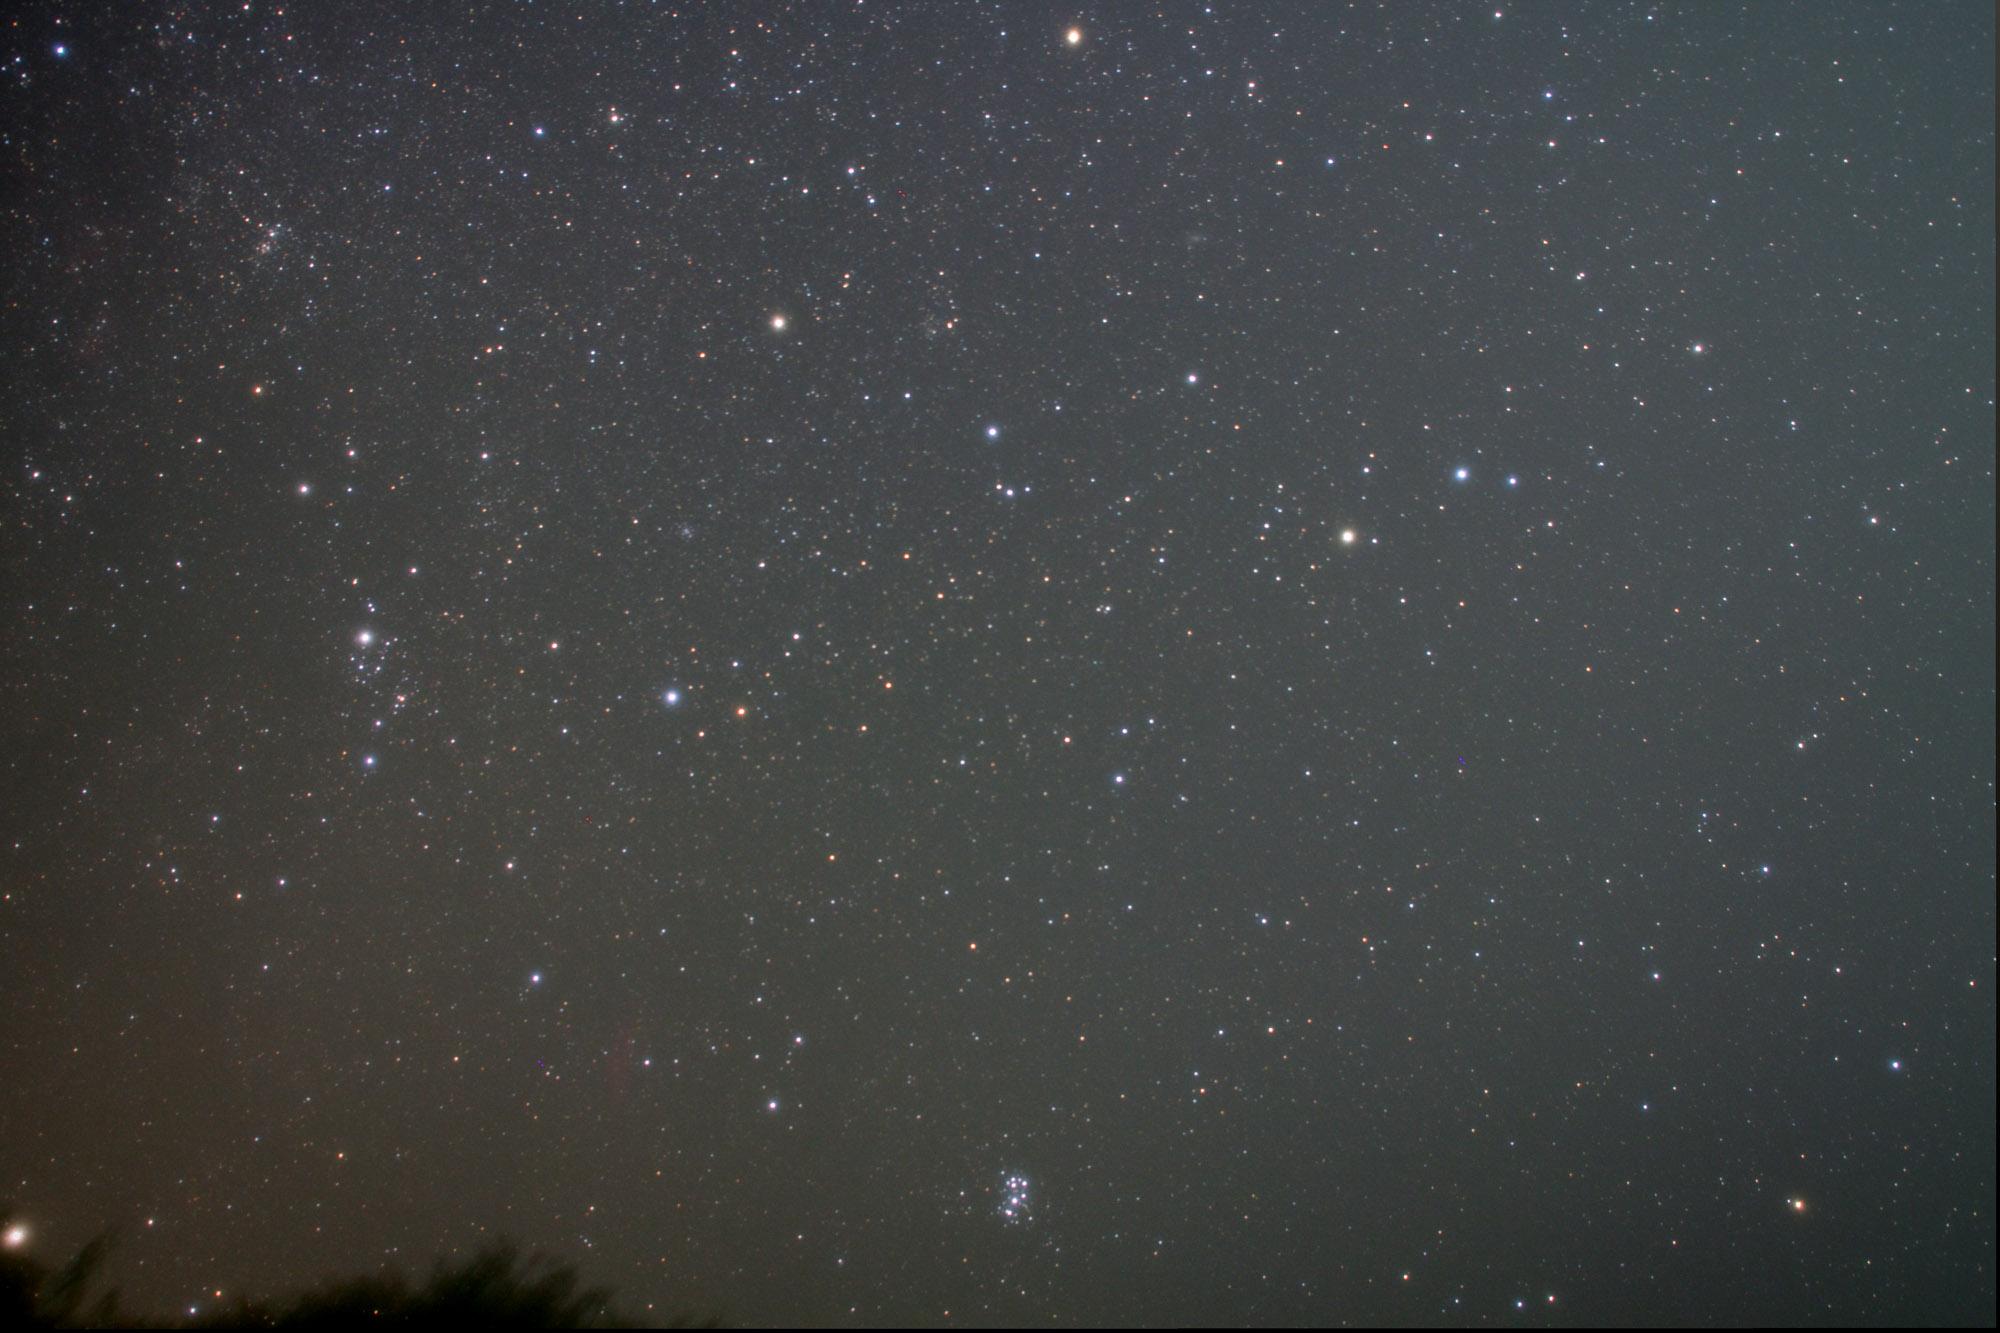 8月14日の星野写真_e0174091_173524.jpg